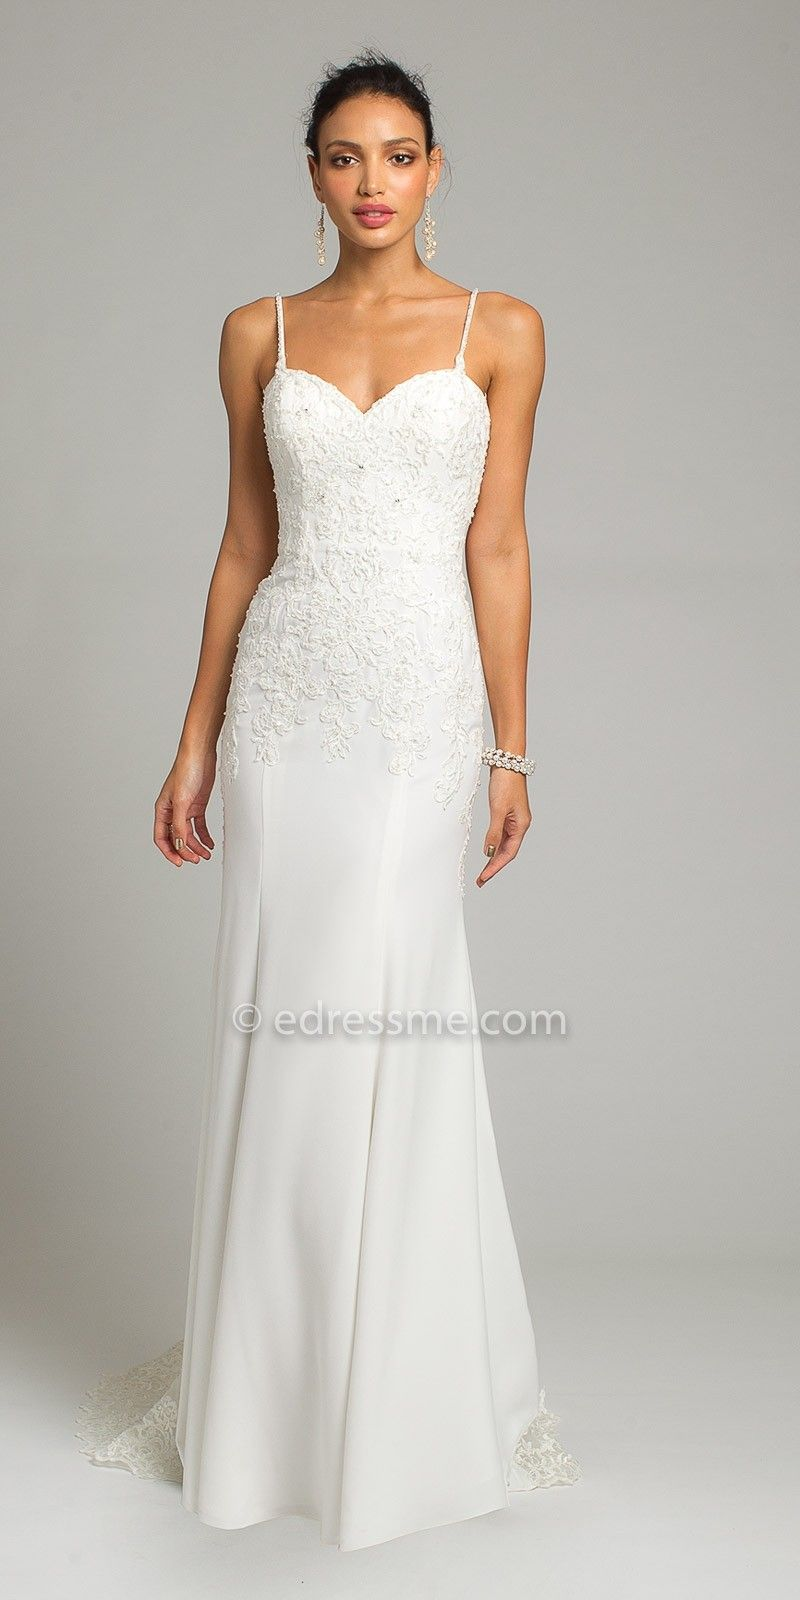 Sheer Illusion Train Crepe Wedding Dress By Camille La Vie | Evening ...